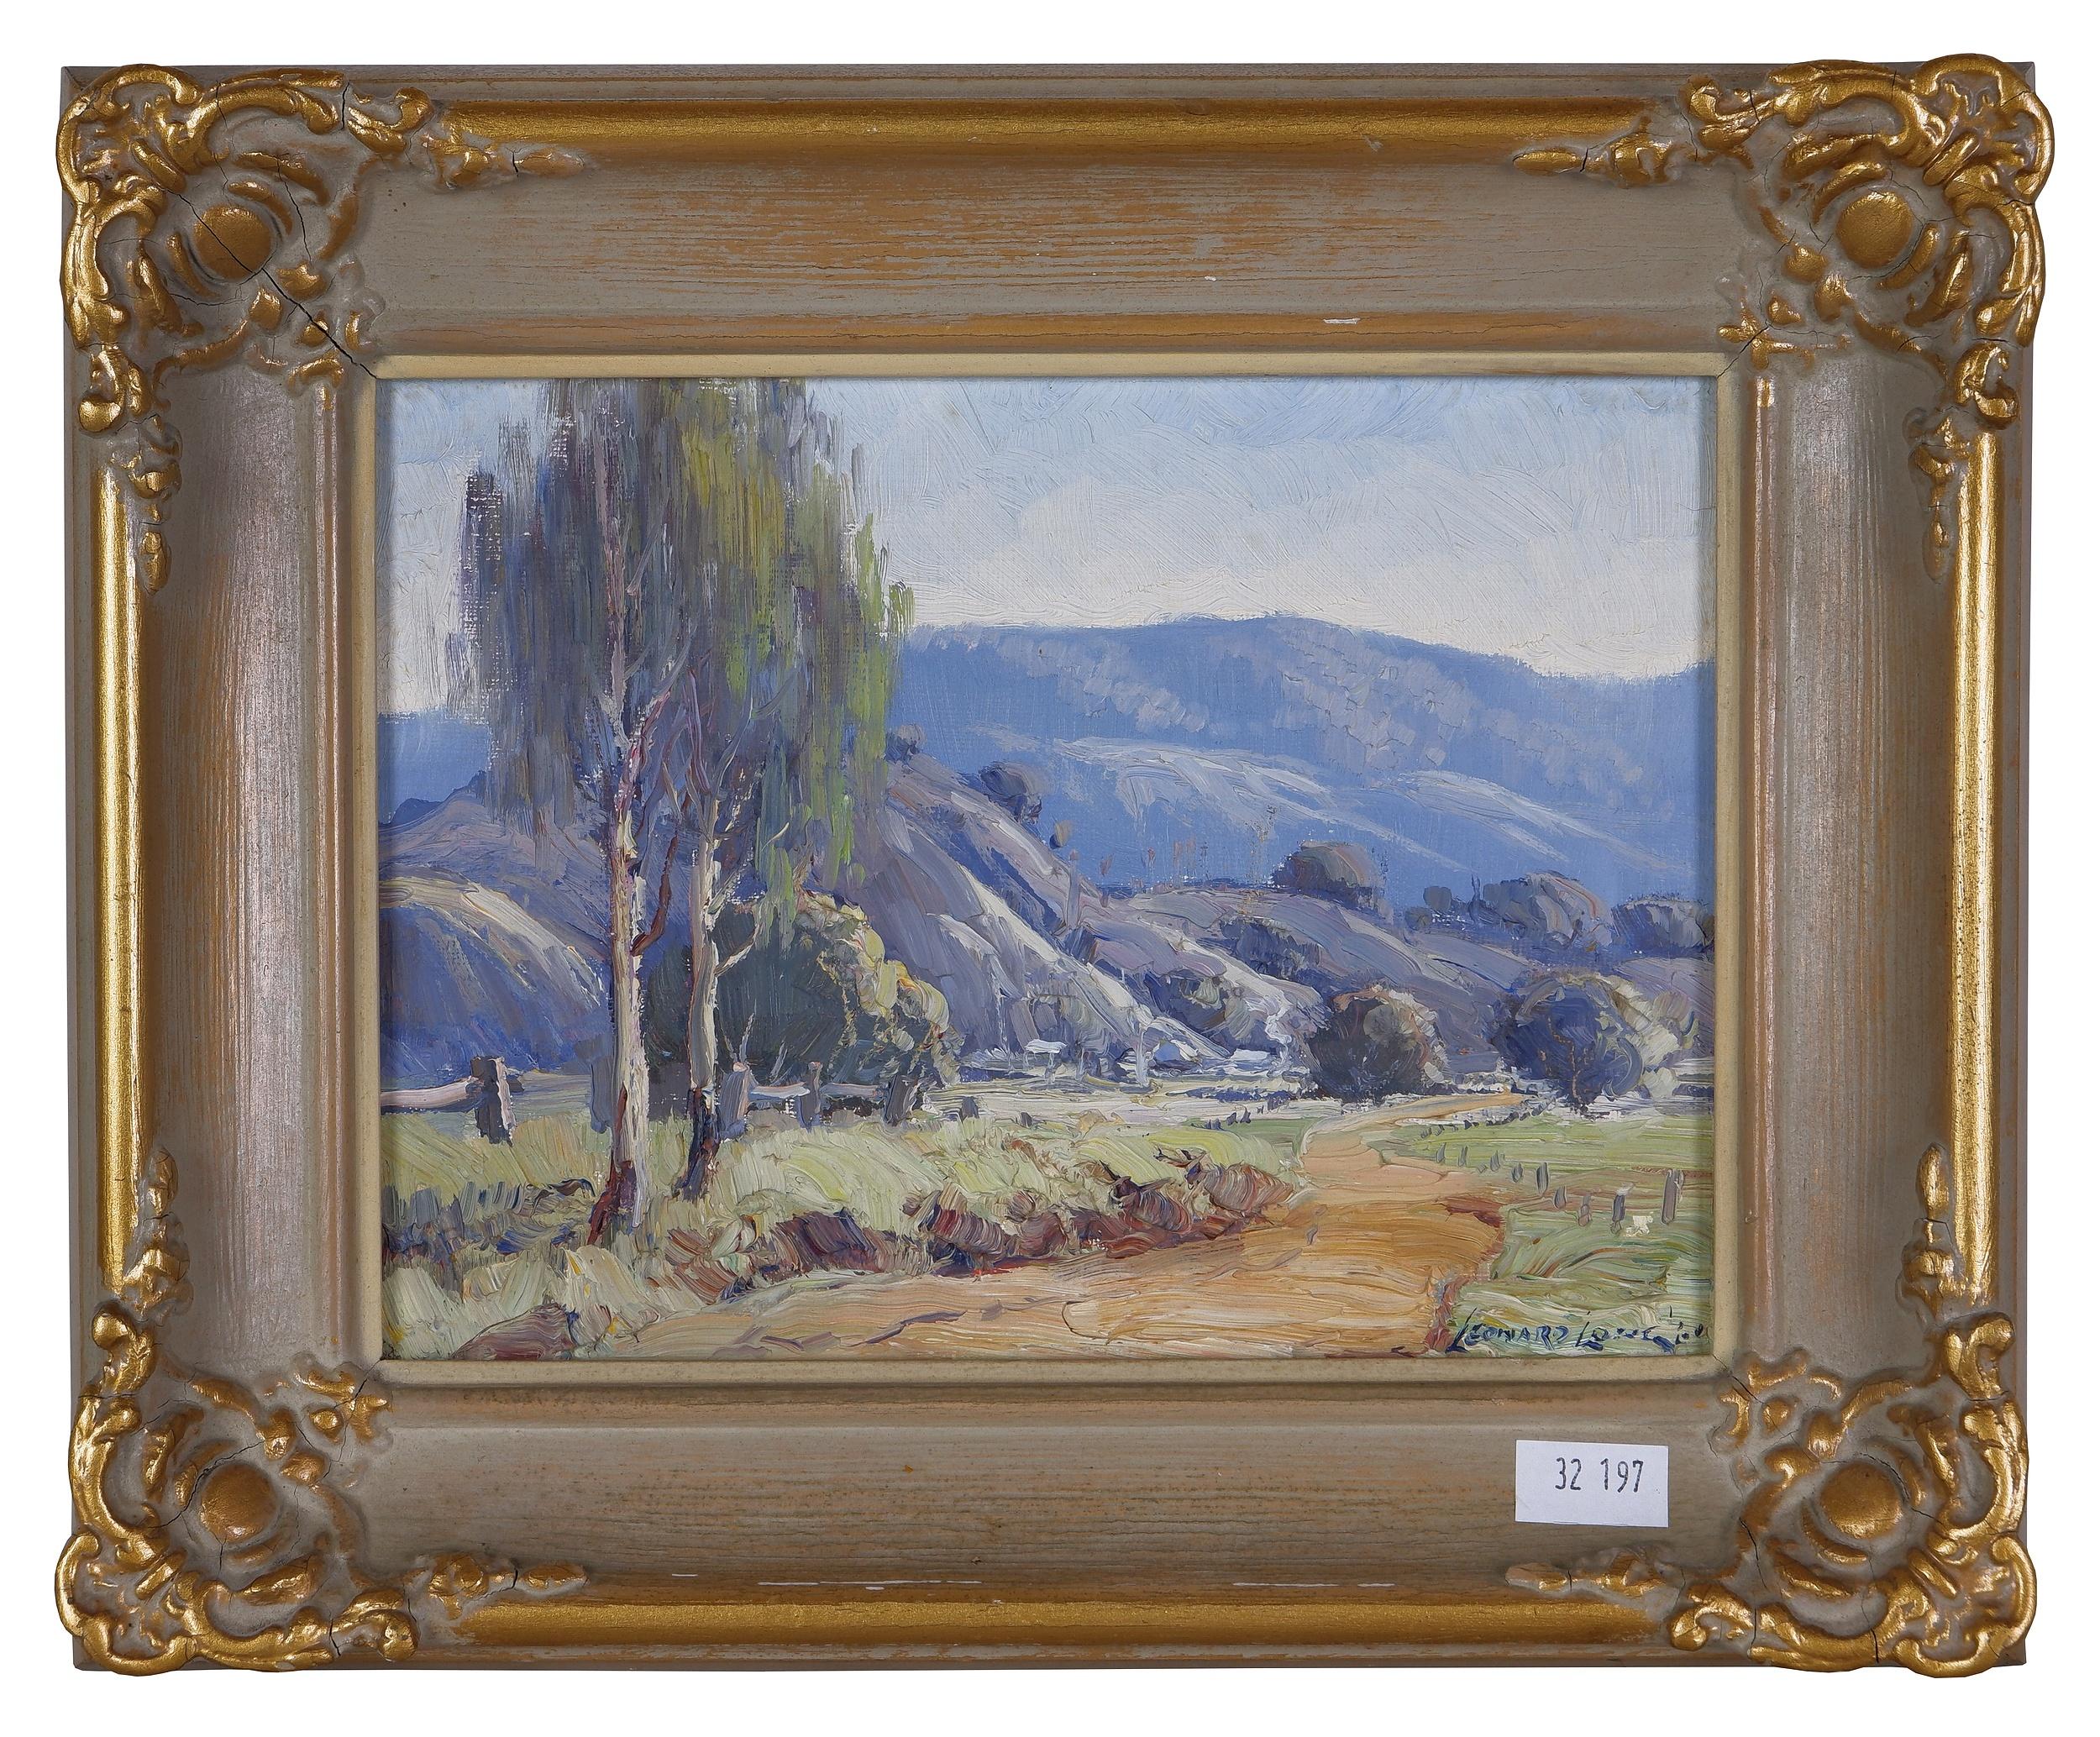 'Leonard Long (1911-2013) To the Farm - Kangaroo Valley, Oil on Board'